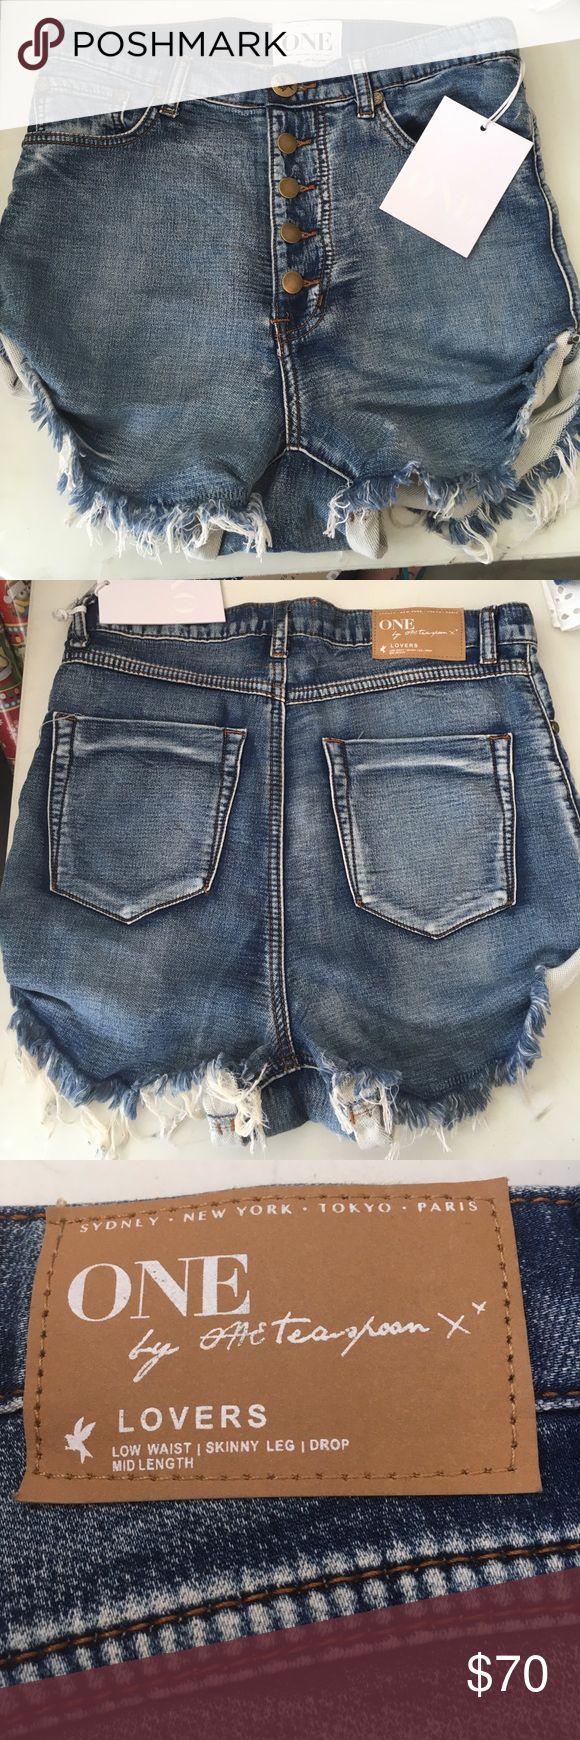 One Teaspoon Shorts NWT size 25 One Teaspoon Shorts NWT size 25 One Teaspoon Shorts Jean Shorts